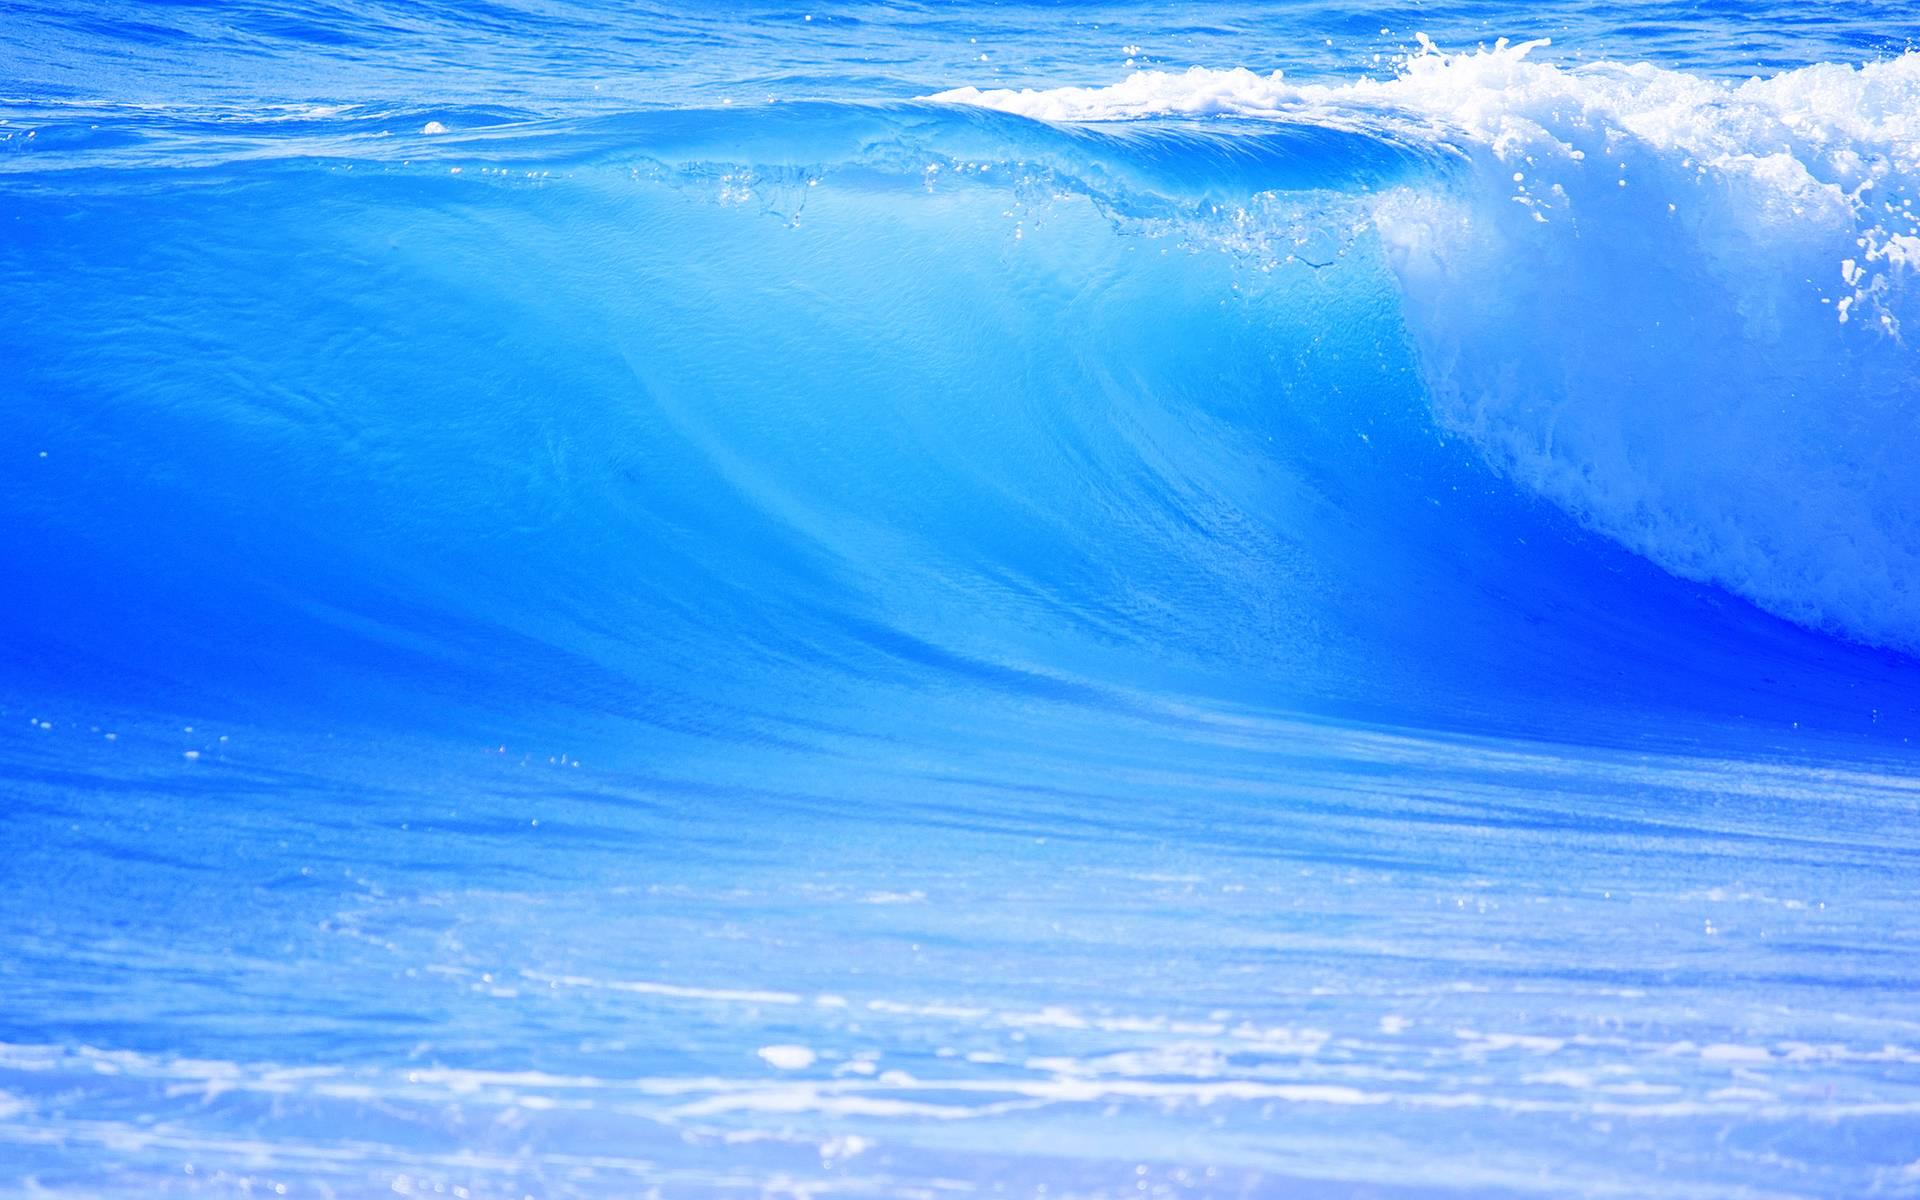 free ocean desktop wallpapers - wallpaper cave